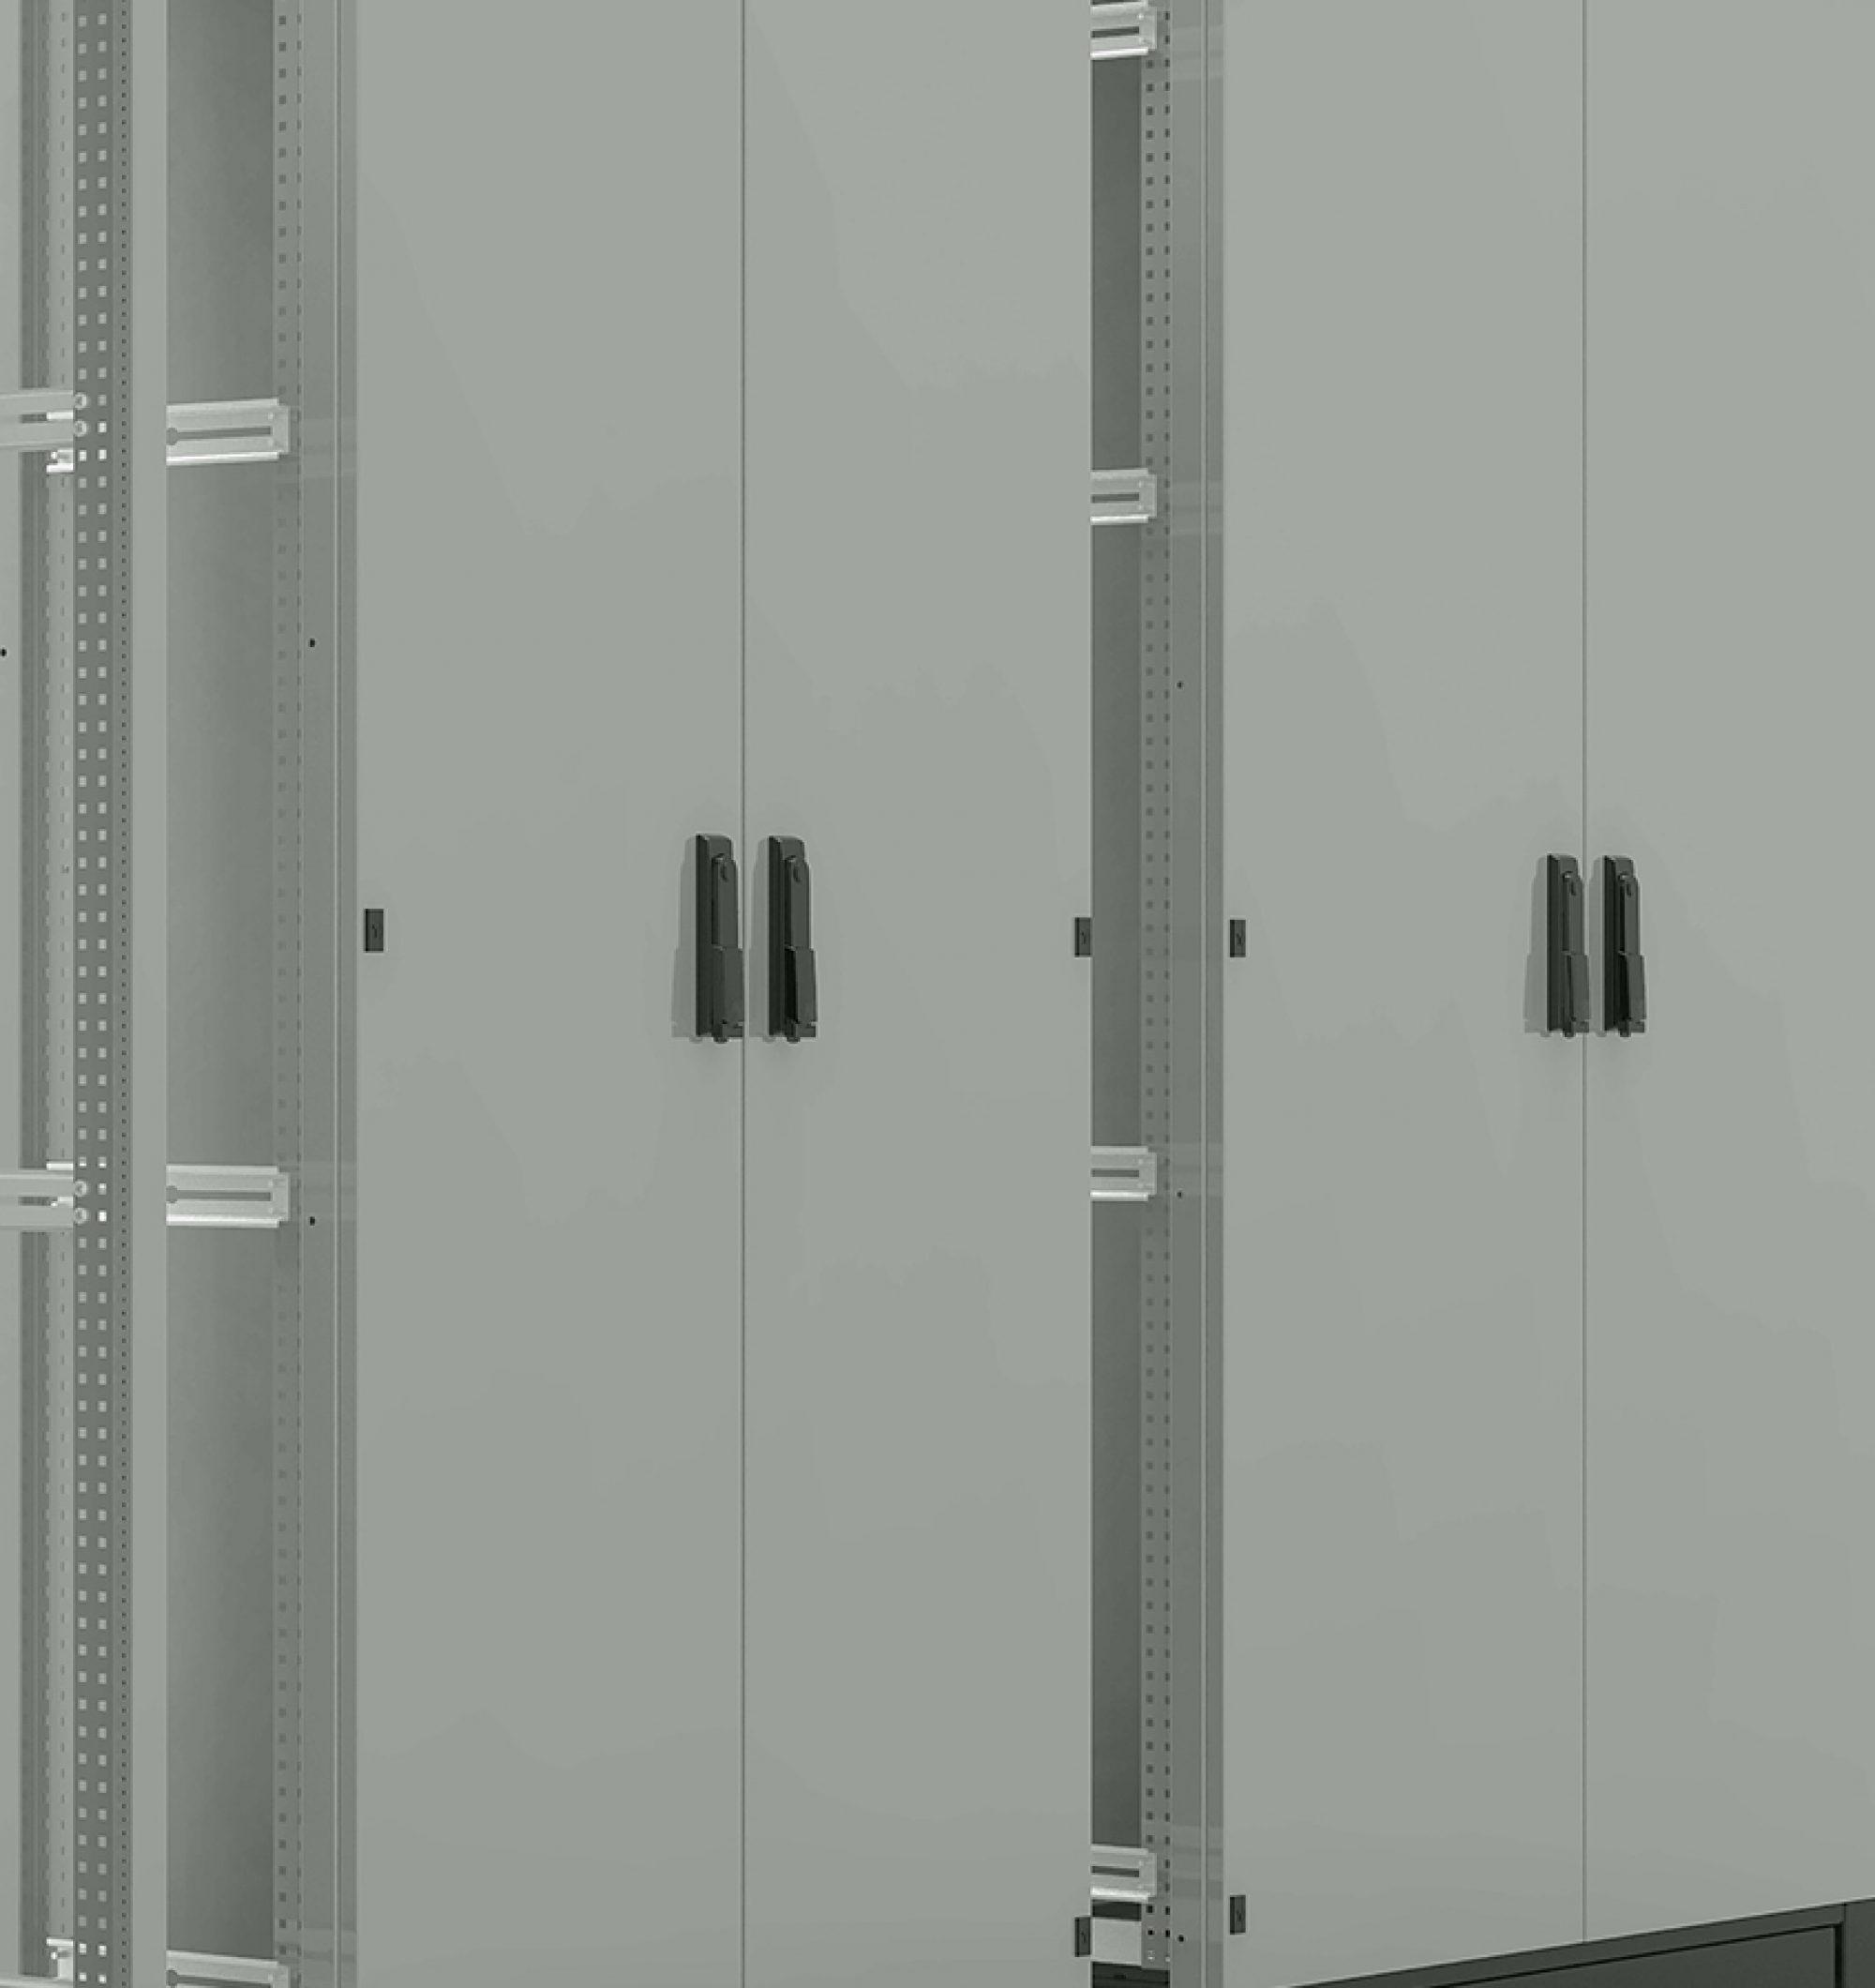 Moduline Enclosure Systems